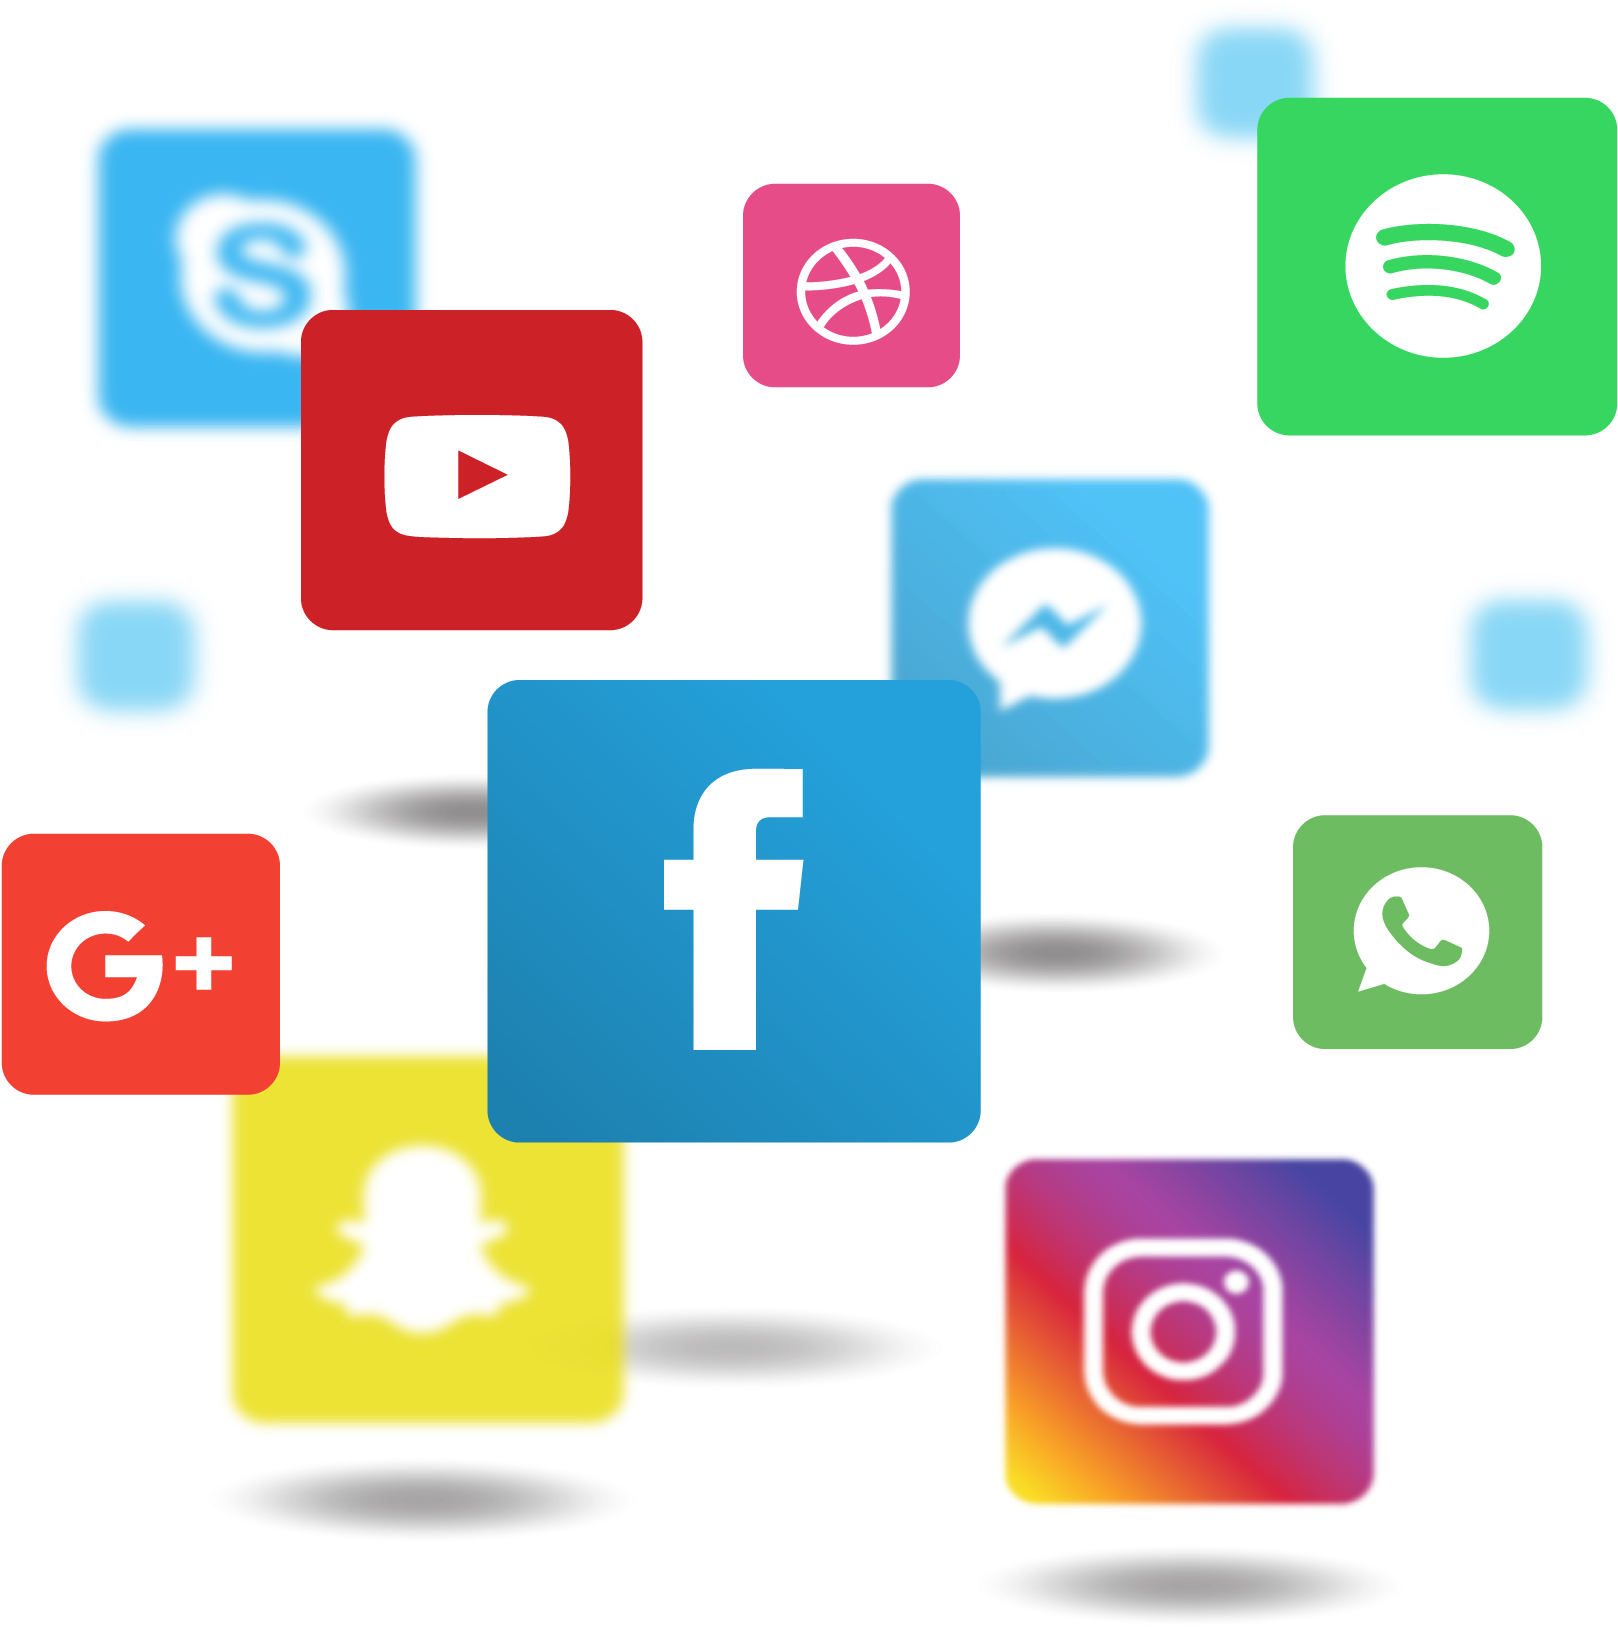 Social Media Png File - Facebook Instagram Circle Logo Clipart (1748x1720), Png Download